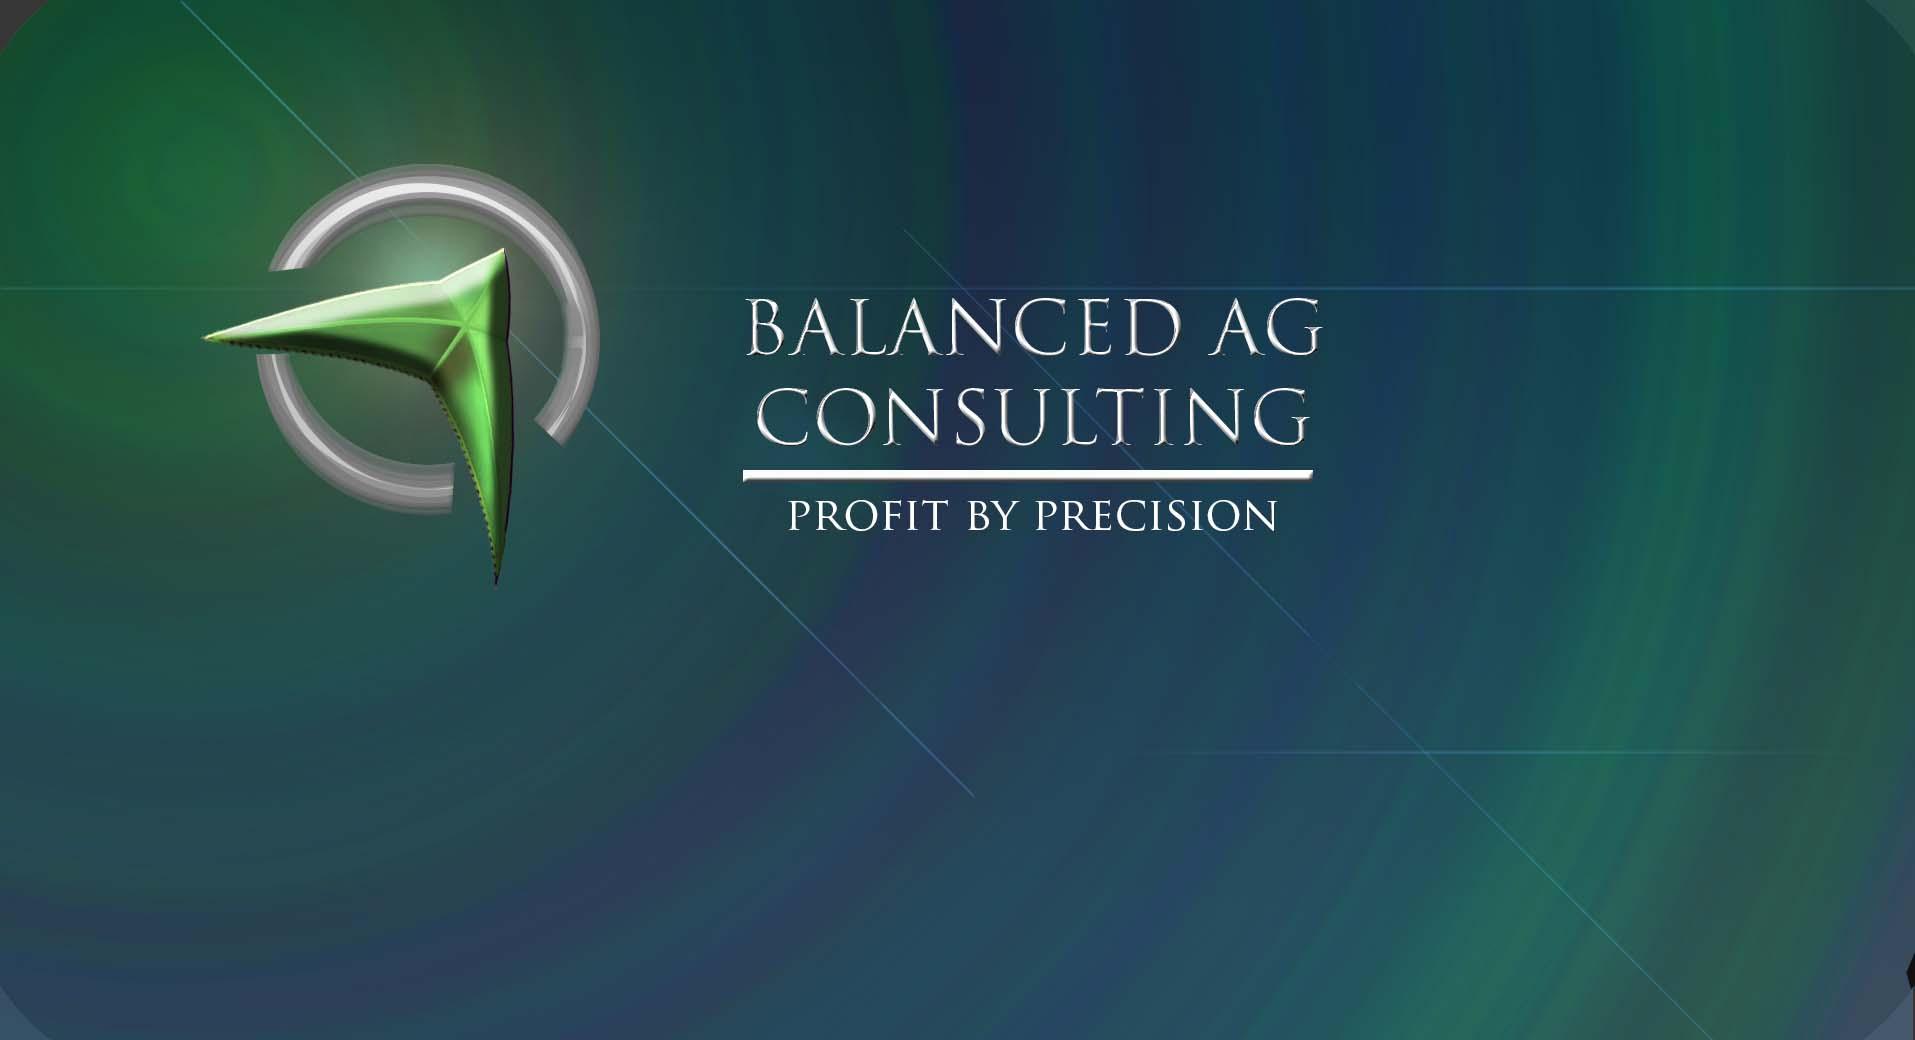 Logo Design by Daniella Eisenberg - Entry No. 221 in the Logo Design Contest Captivating Logo Design for Balanced Ag Consulting.